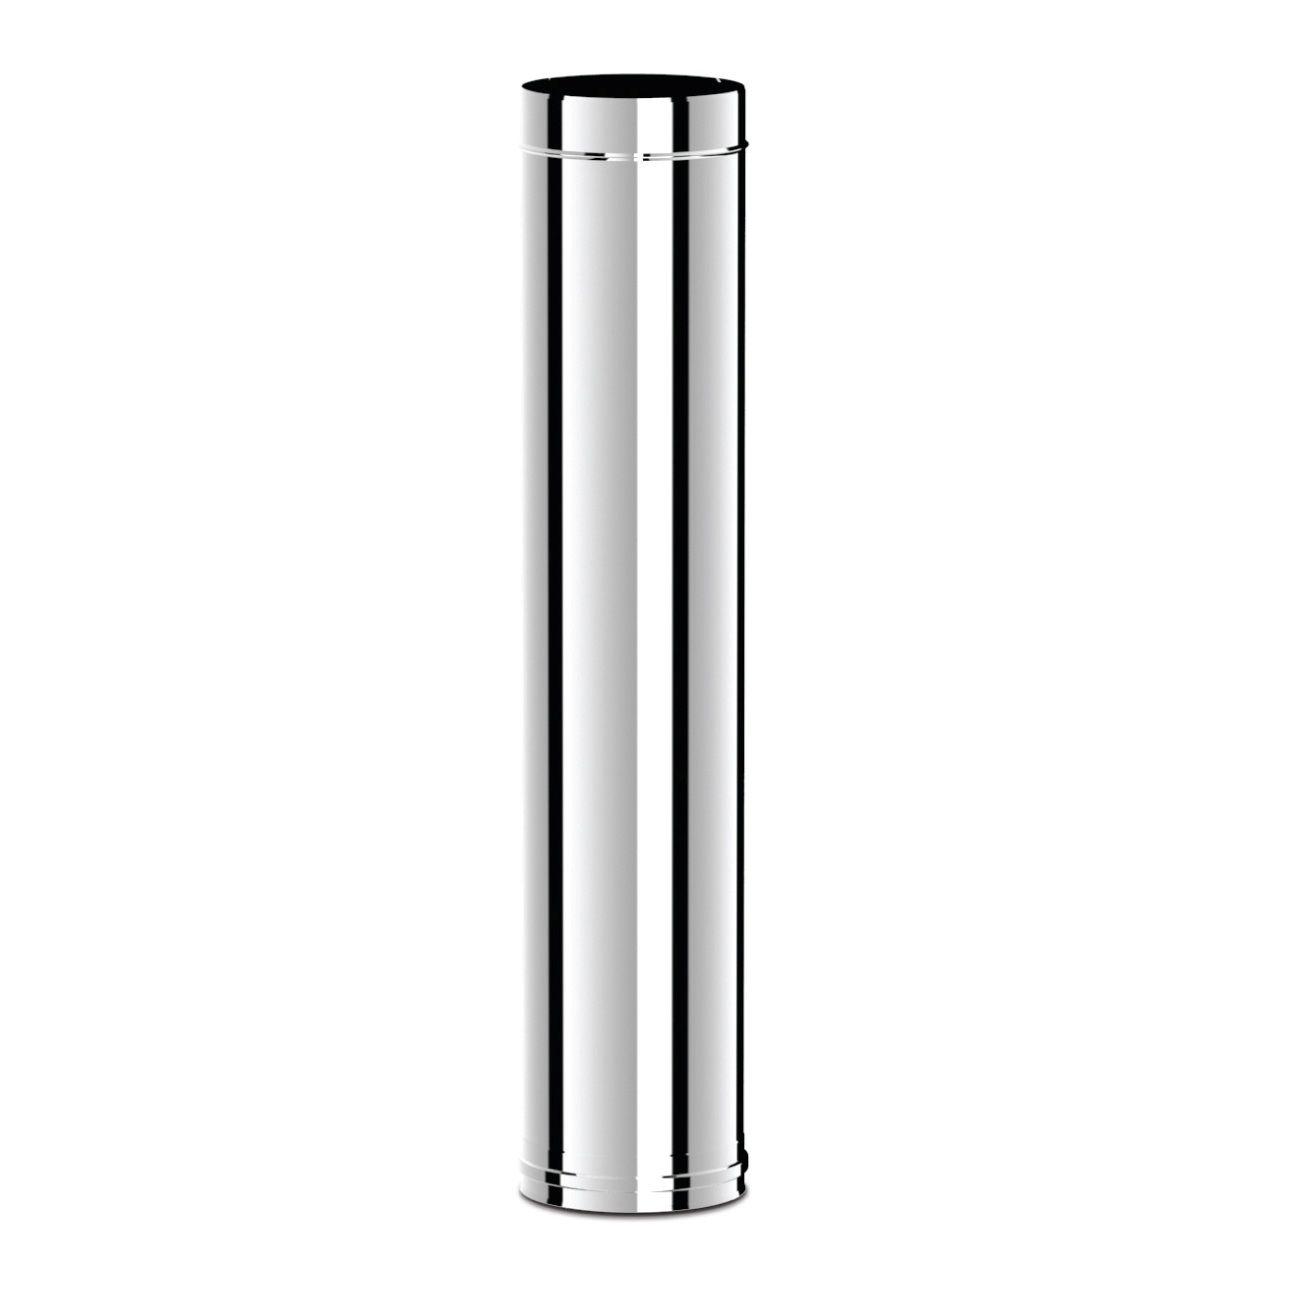 Ø180 Труба дымоходная 1000 mm (inox 316L)